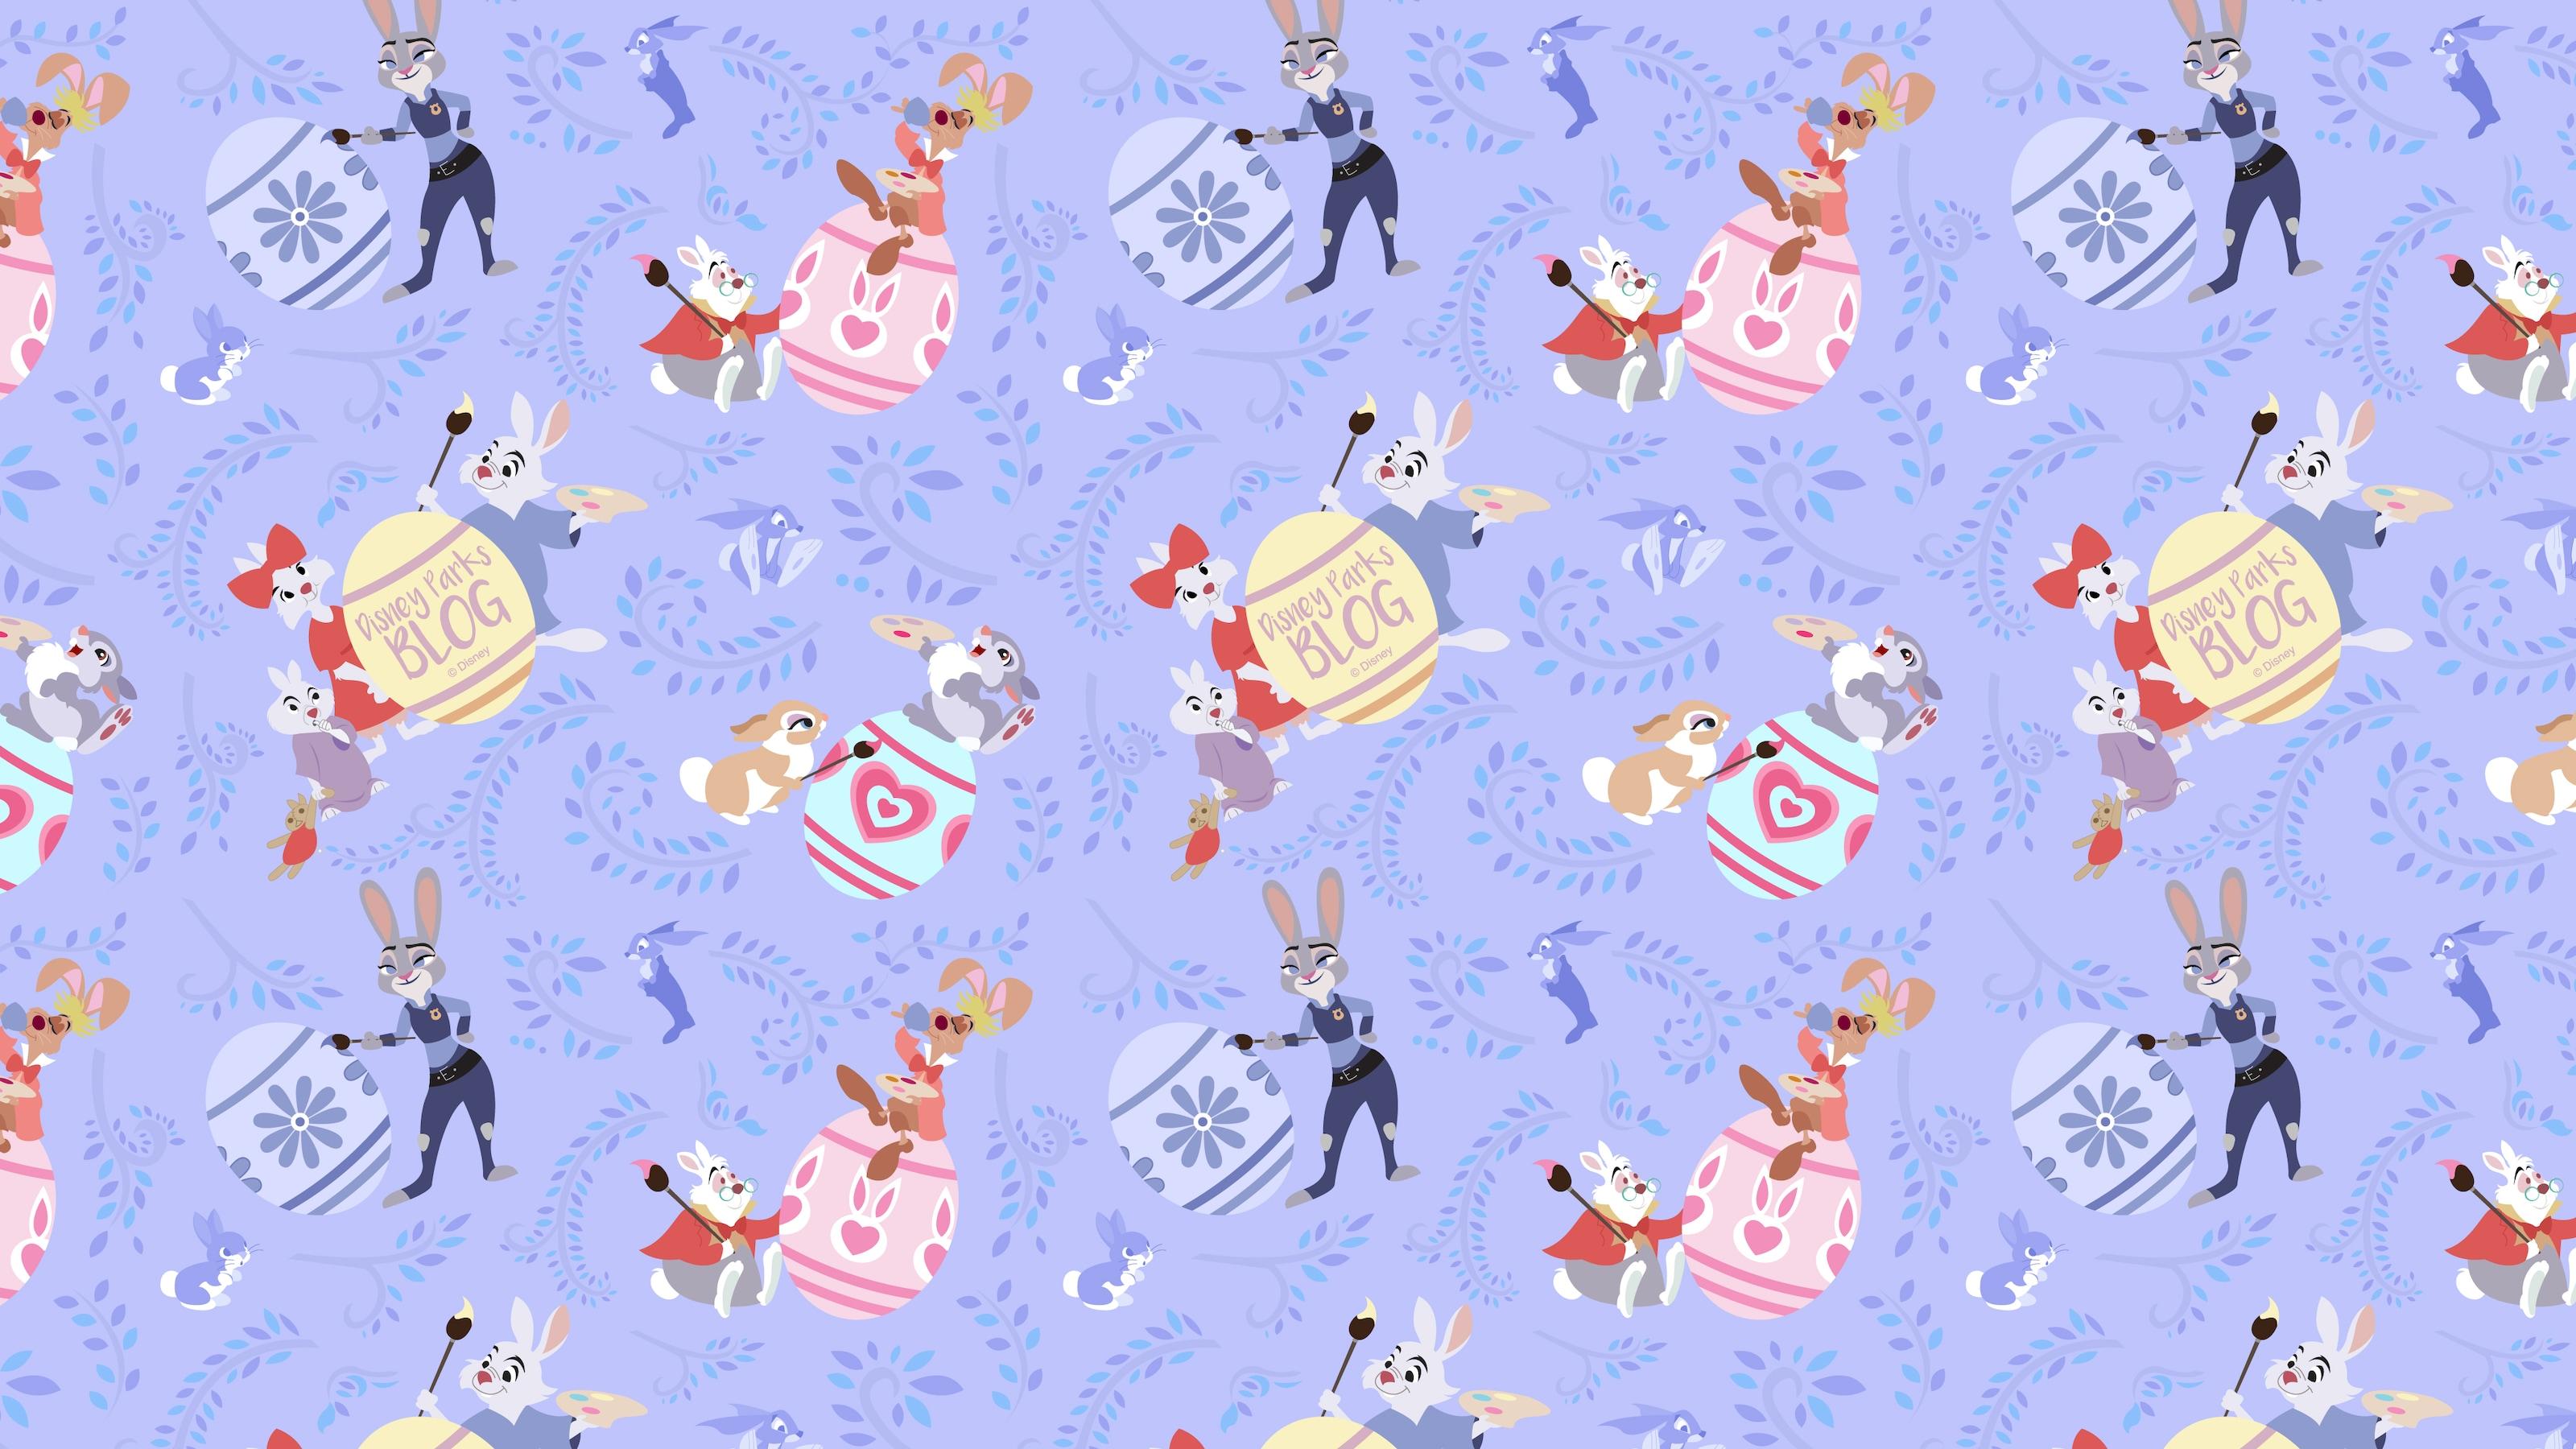 2019 Easter Wallpaper Desktop Ipad Disney Parks Blog